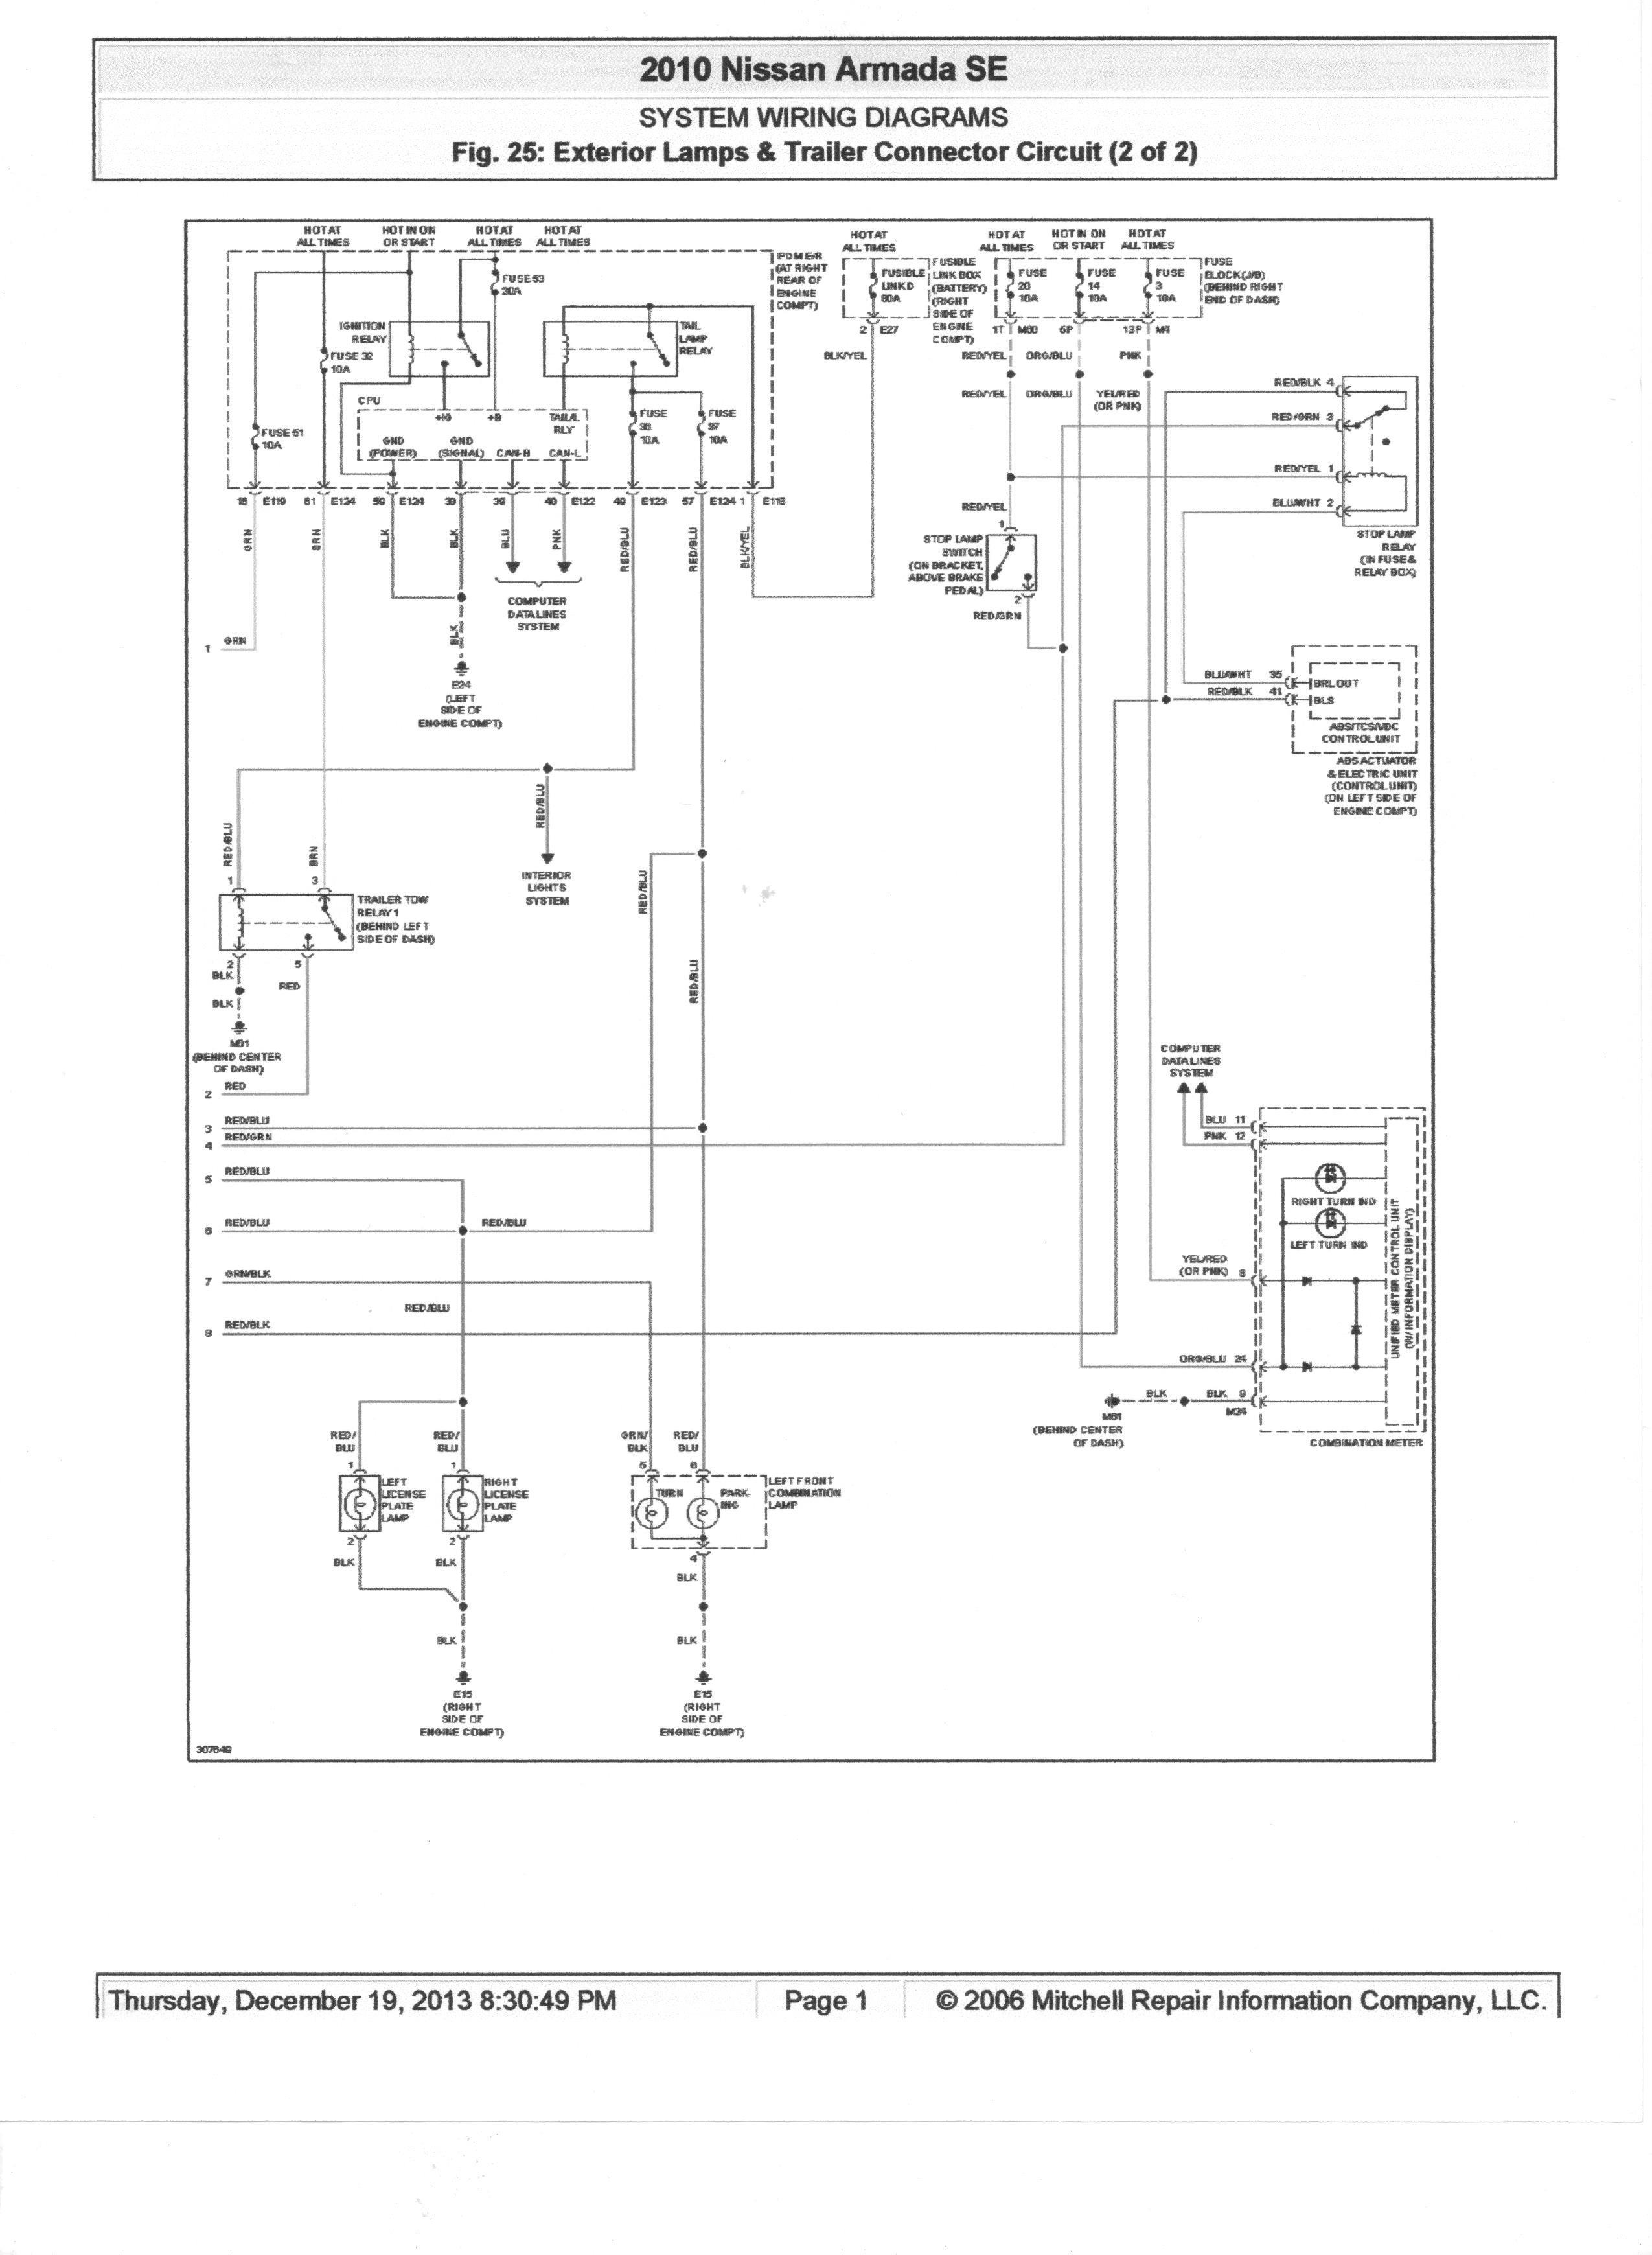 2010 Nissan Pathfinder Wiring Diagram Electric Brake Breakaway Wiring Diagram Begeboy Wiring Diagram Source